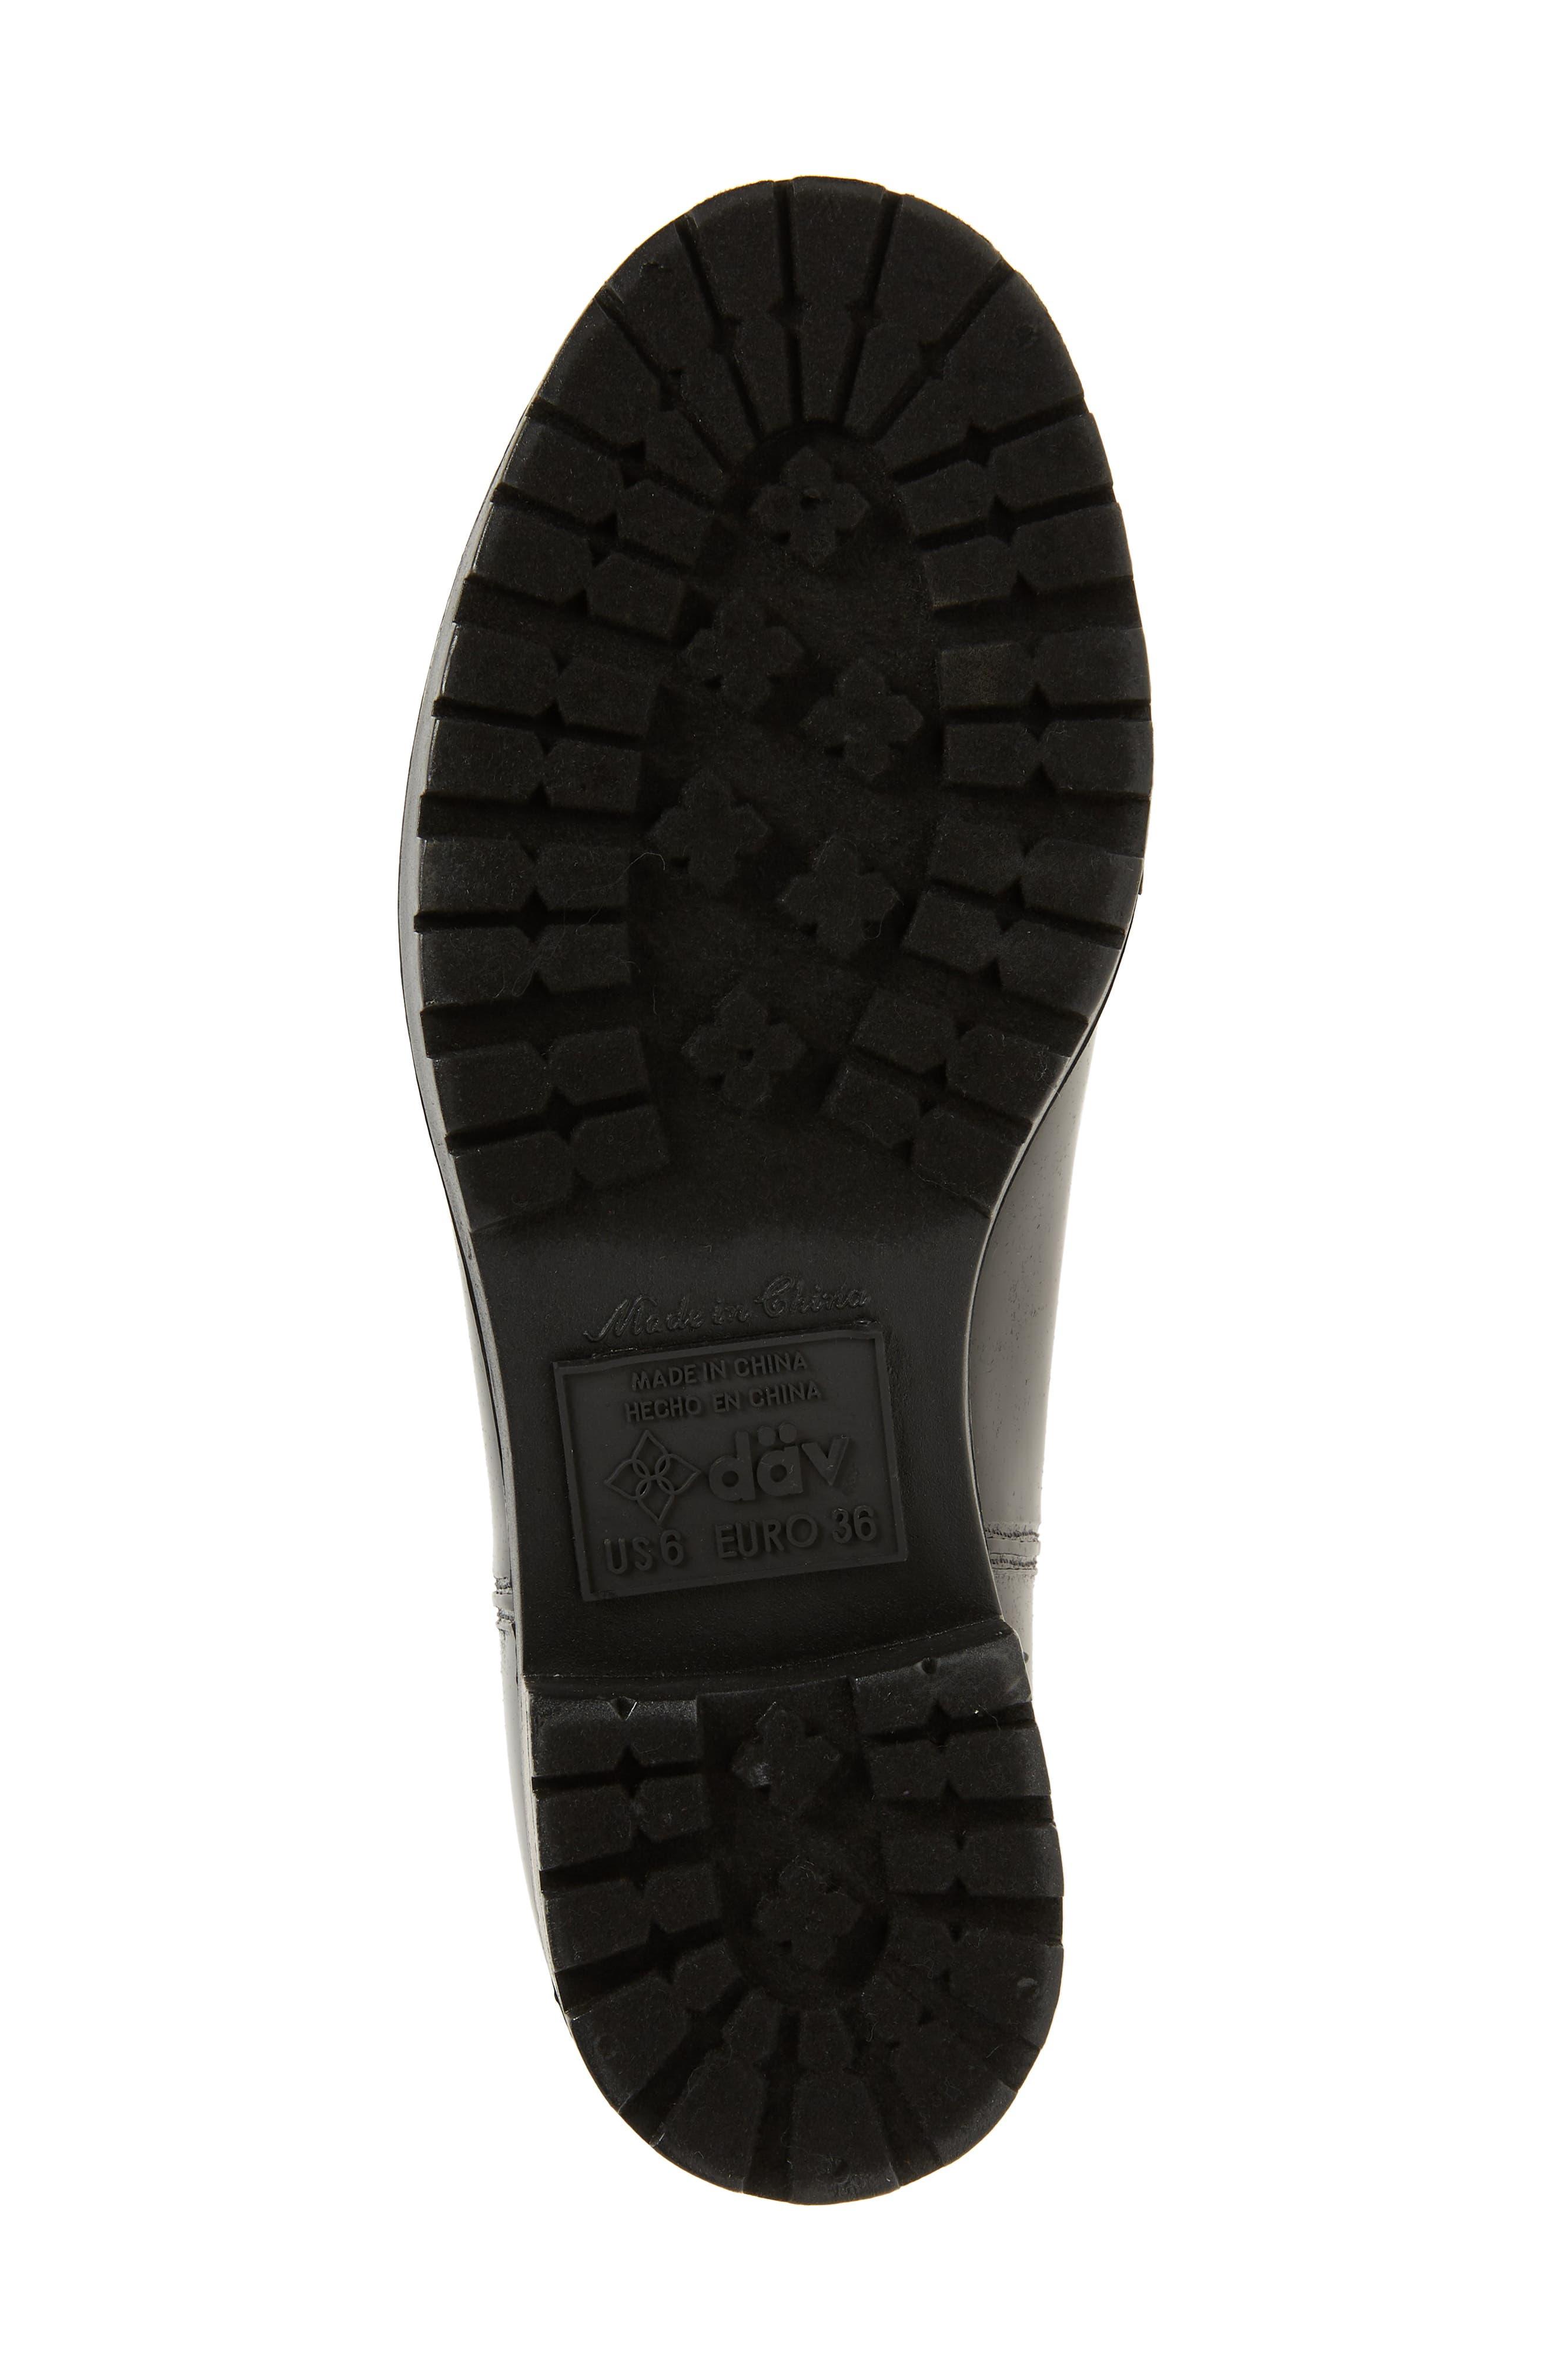 Parma 2 Tall Waterproof Rain Boot,                             Alternate thumbnail 6, color,                             BLACK FABRIC